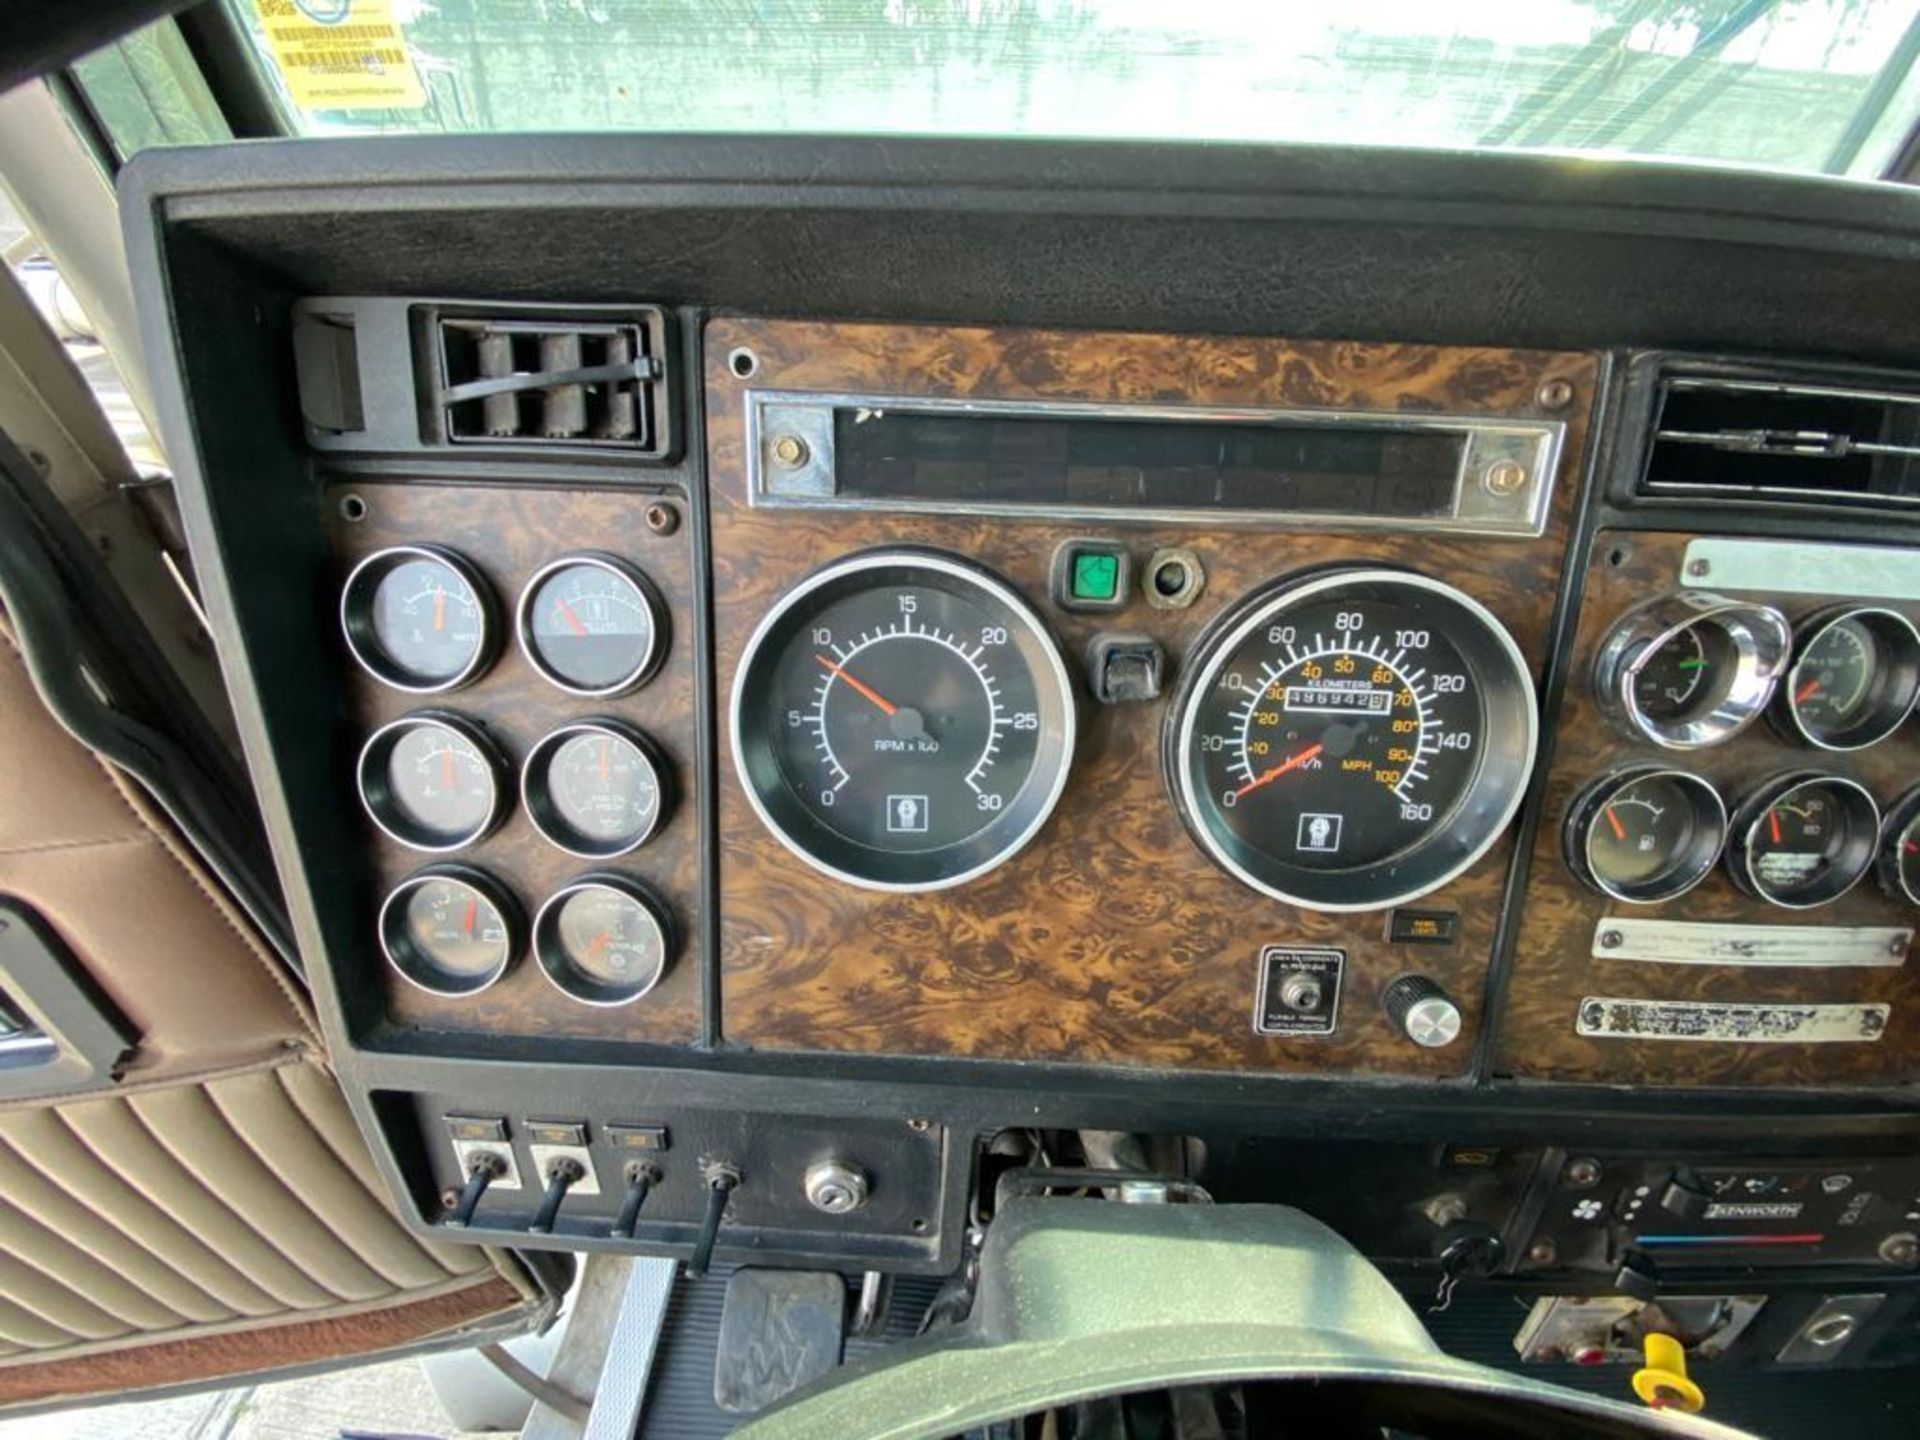 1998 Kenworth Sleeper truck tractor, standard transmission of 18 speeds - Image 41 of 75